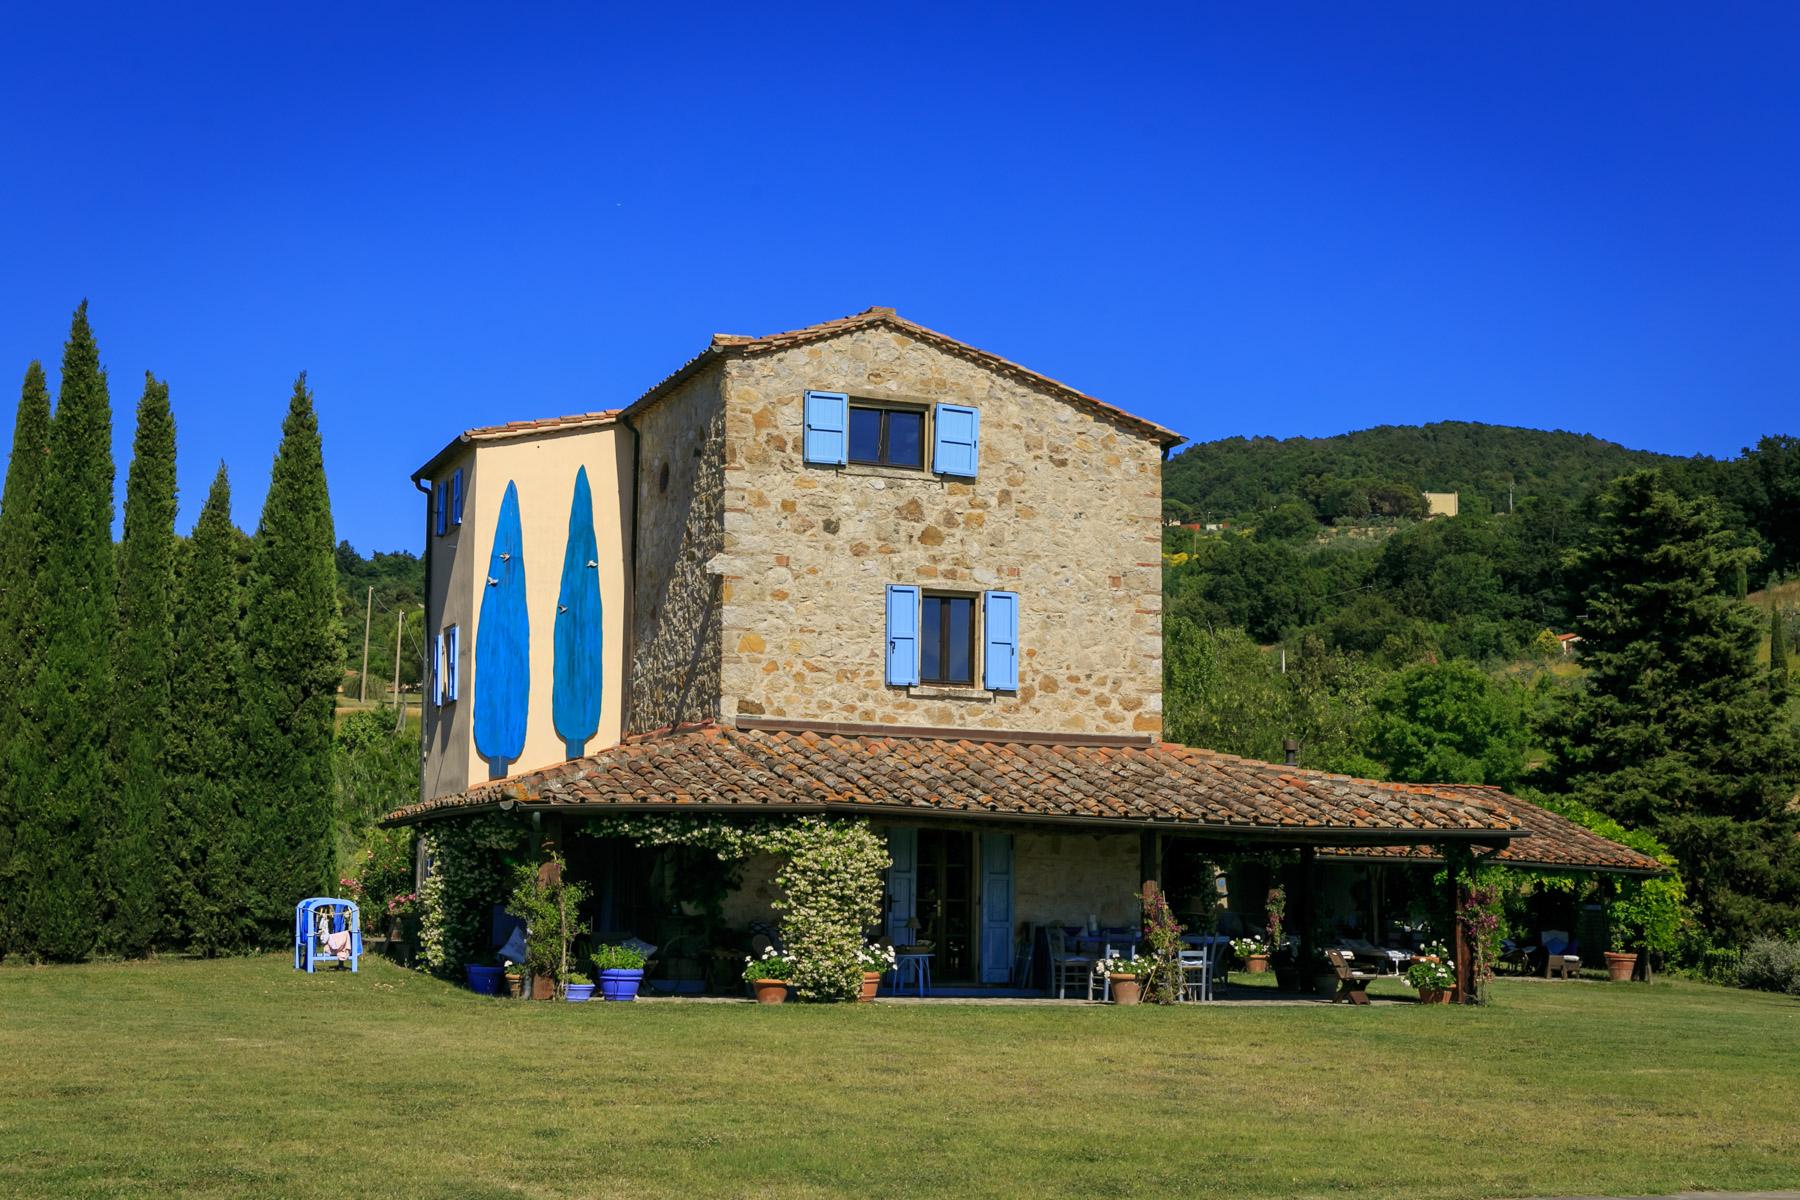 Villa in Vendita a Santa Luce: 5 locali, 270 mq - Foto 3